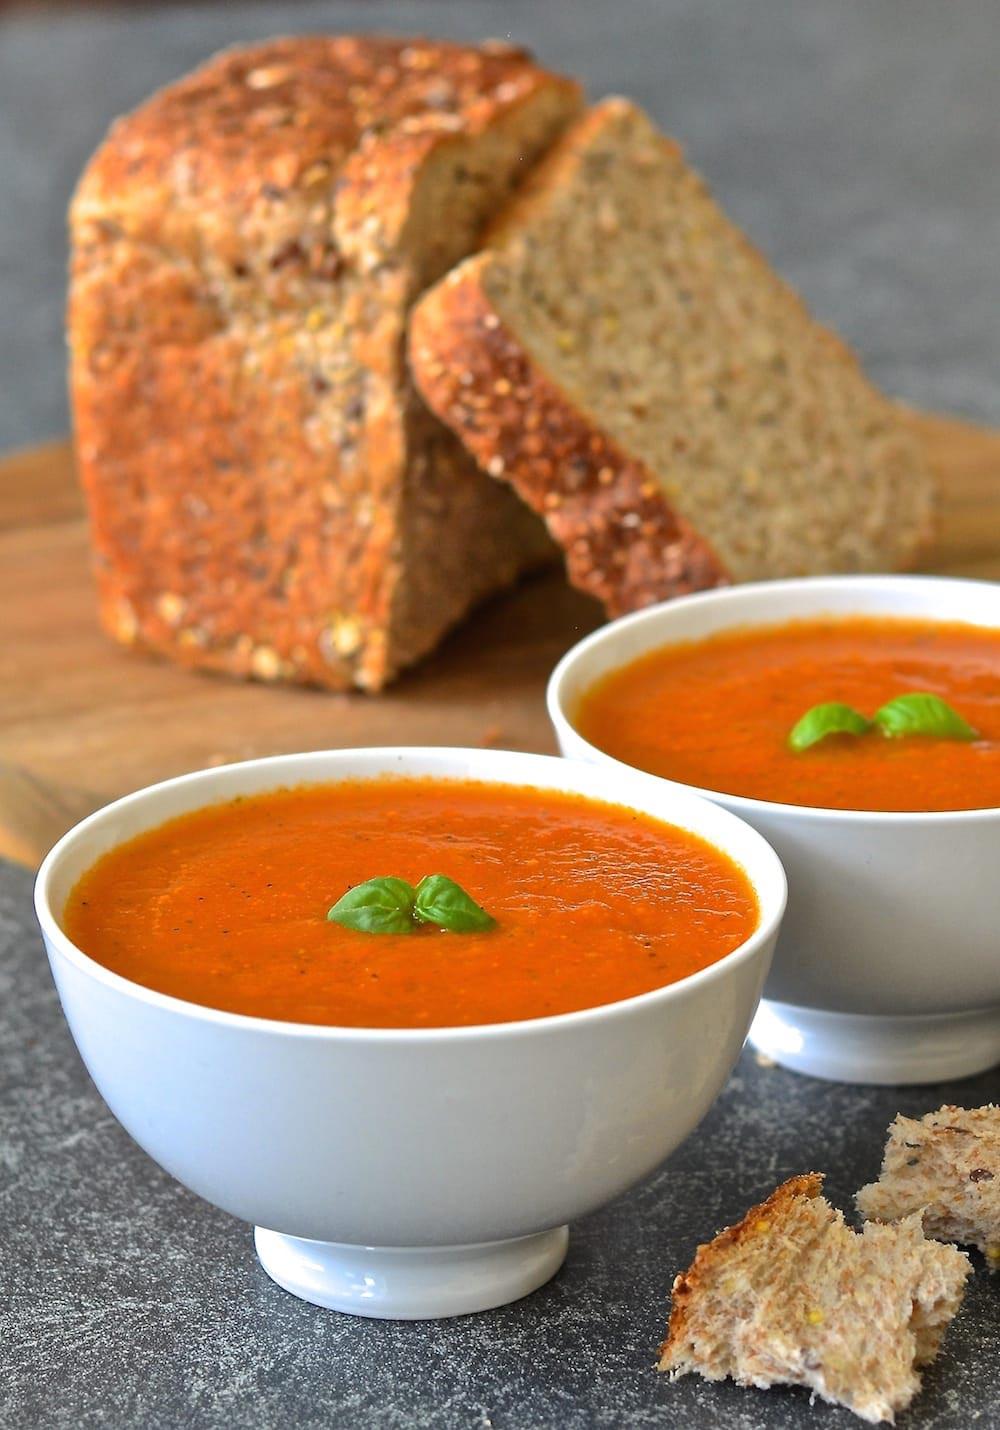 tomato basil soup in bowls